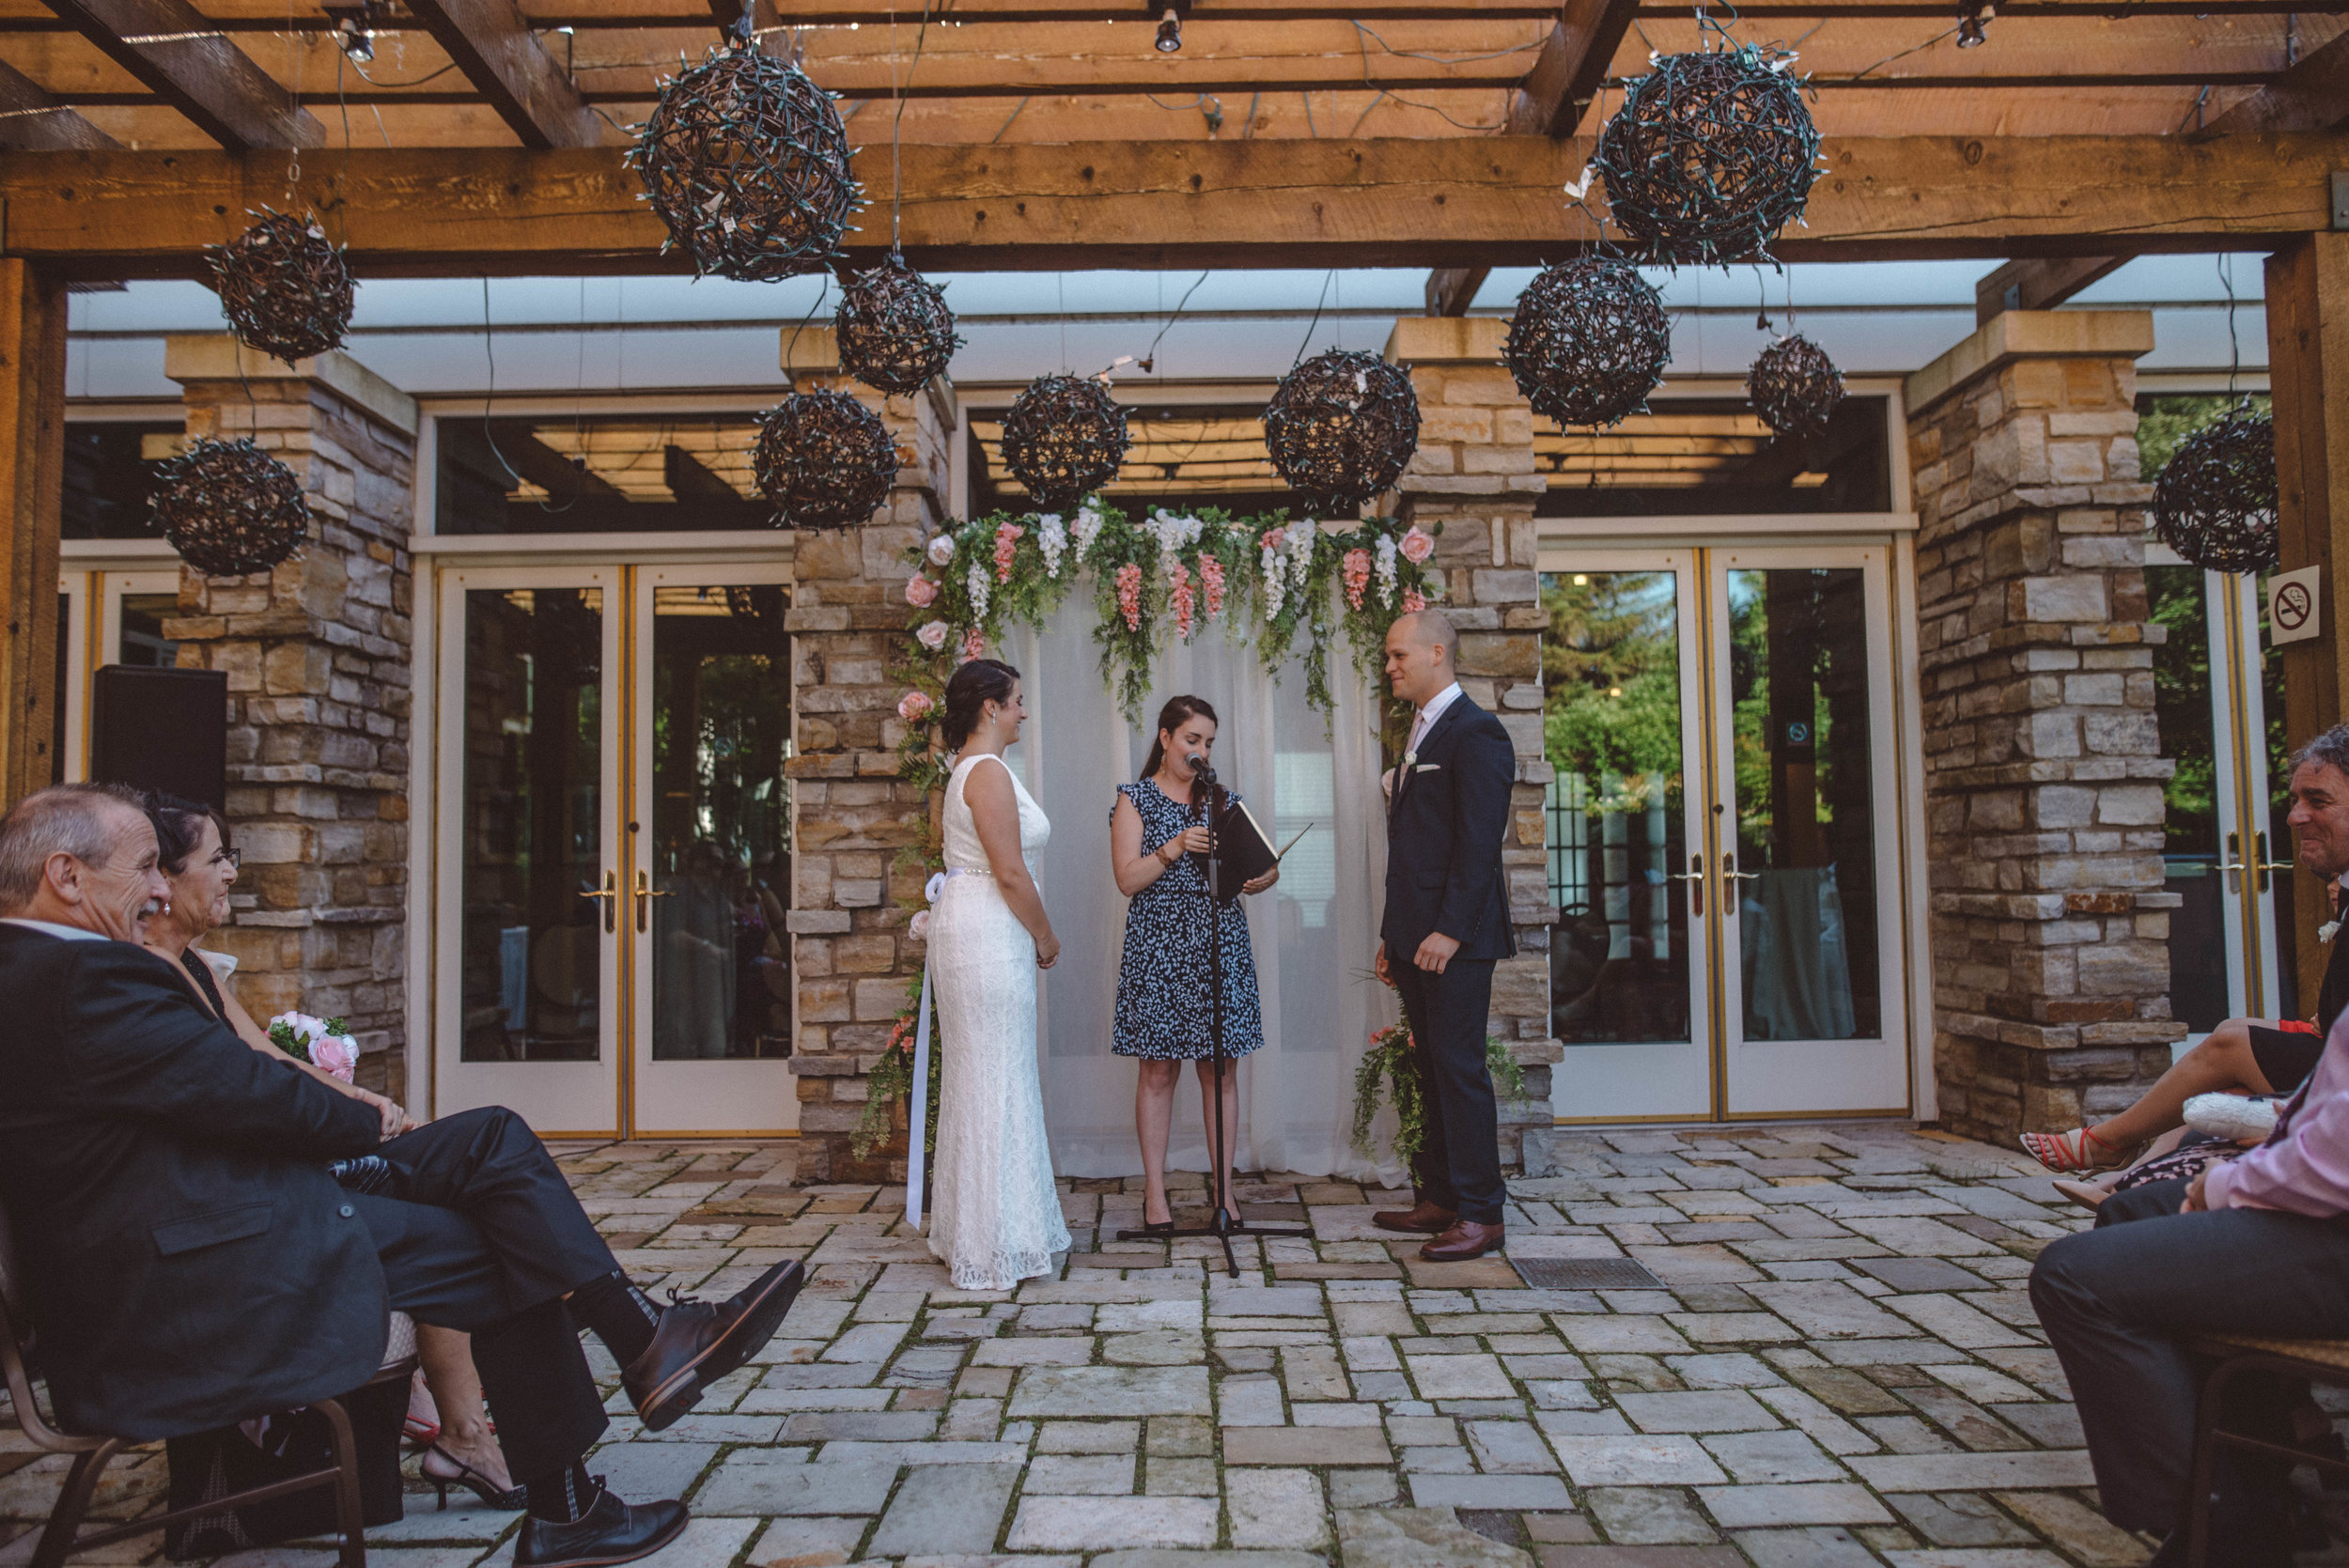 photographe_mariage_gatineau_hull_outaouais_photographer_ottawa_wedding_hilton-19.jpg